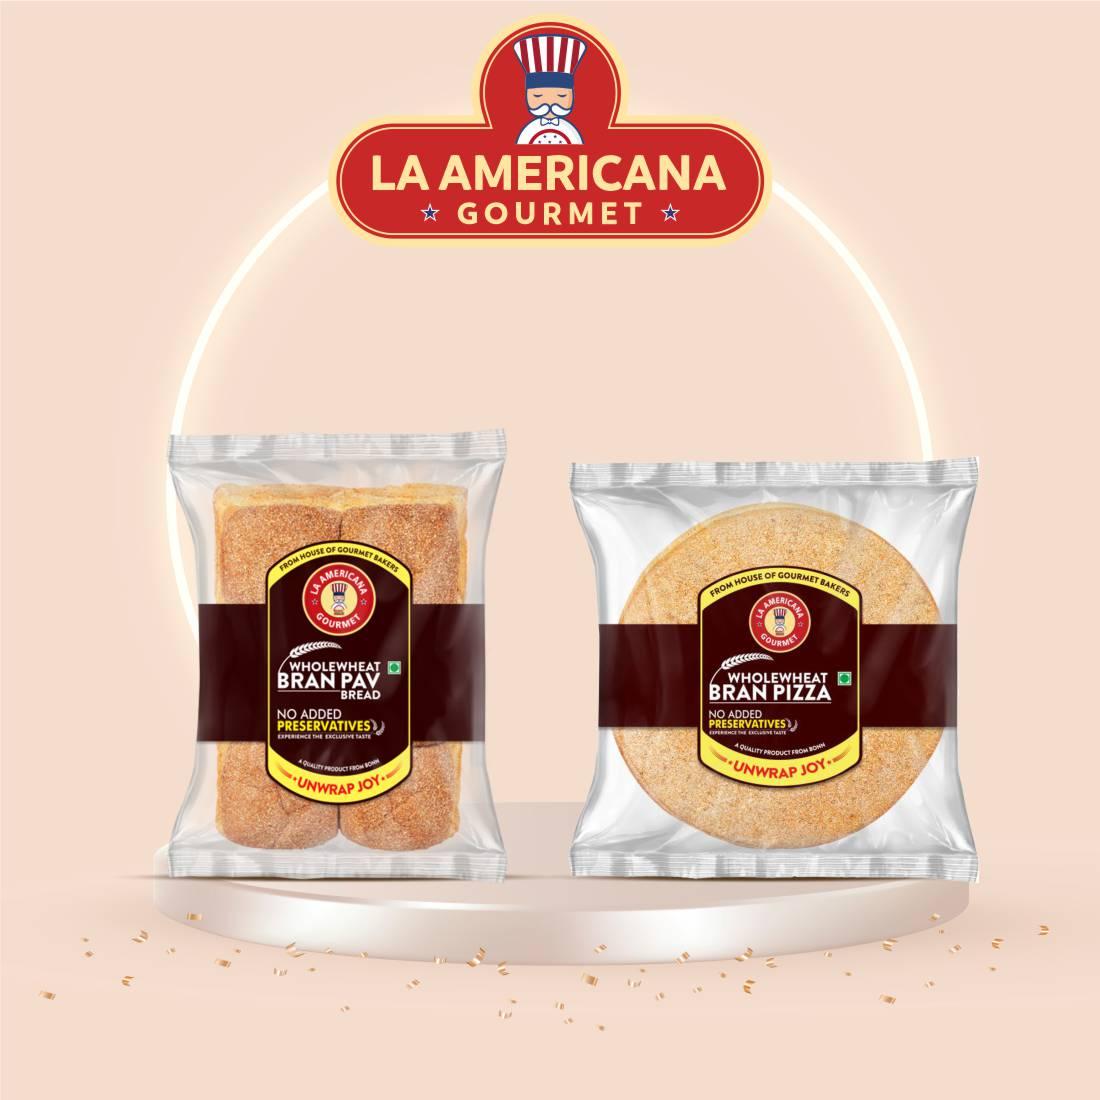 La Americana Wholewheat Bran Pav Bread 250g, and La Americana Wholewheat Bran Pizza 200g, (Pack of 1 each)